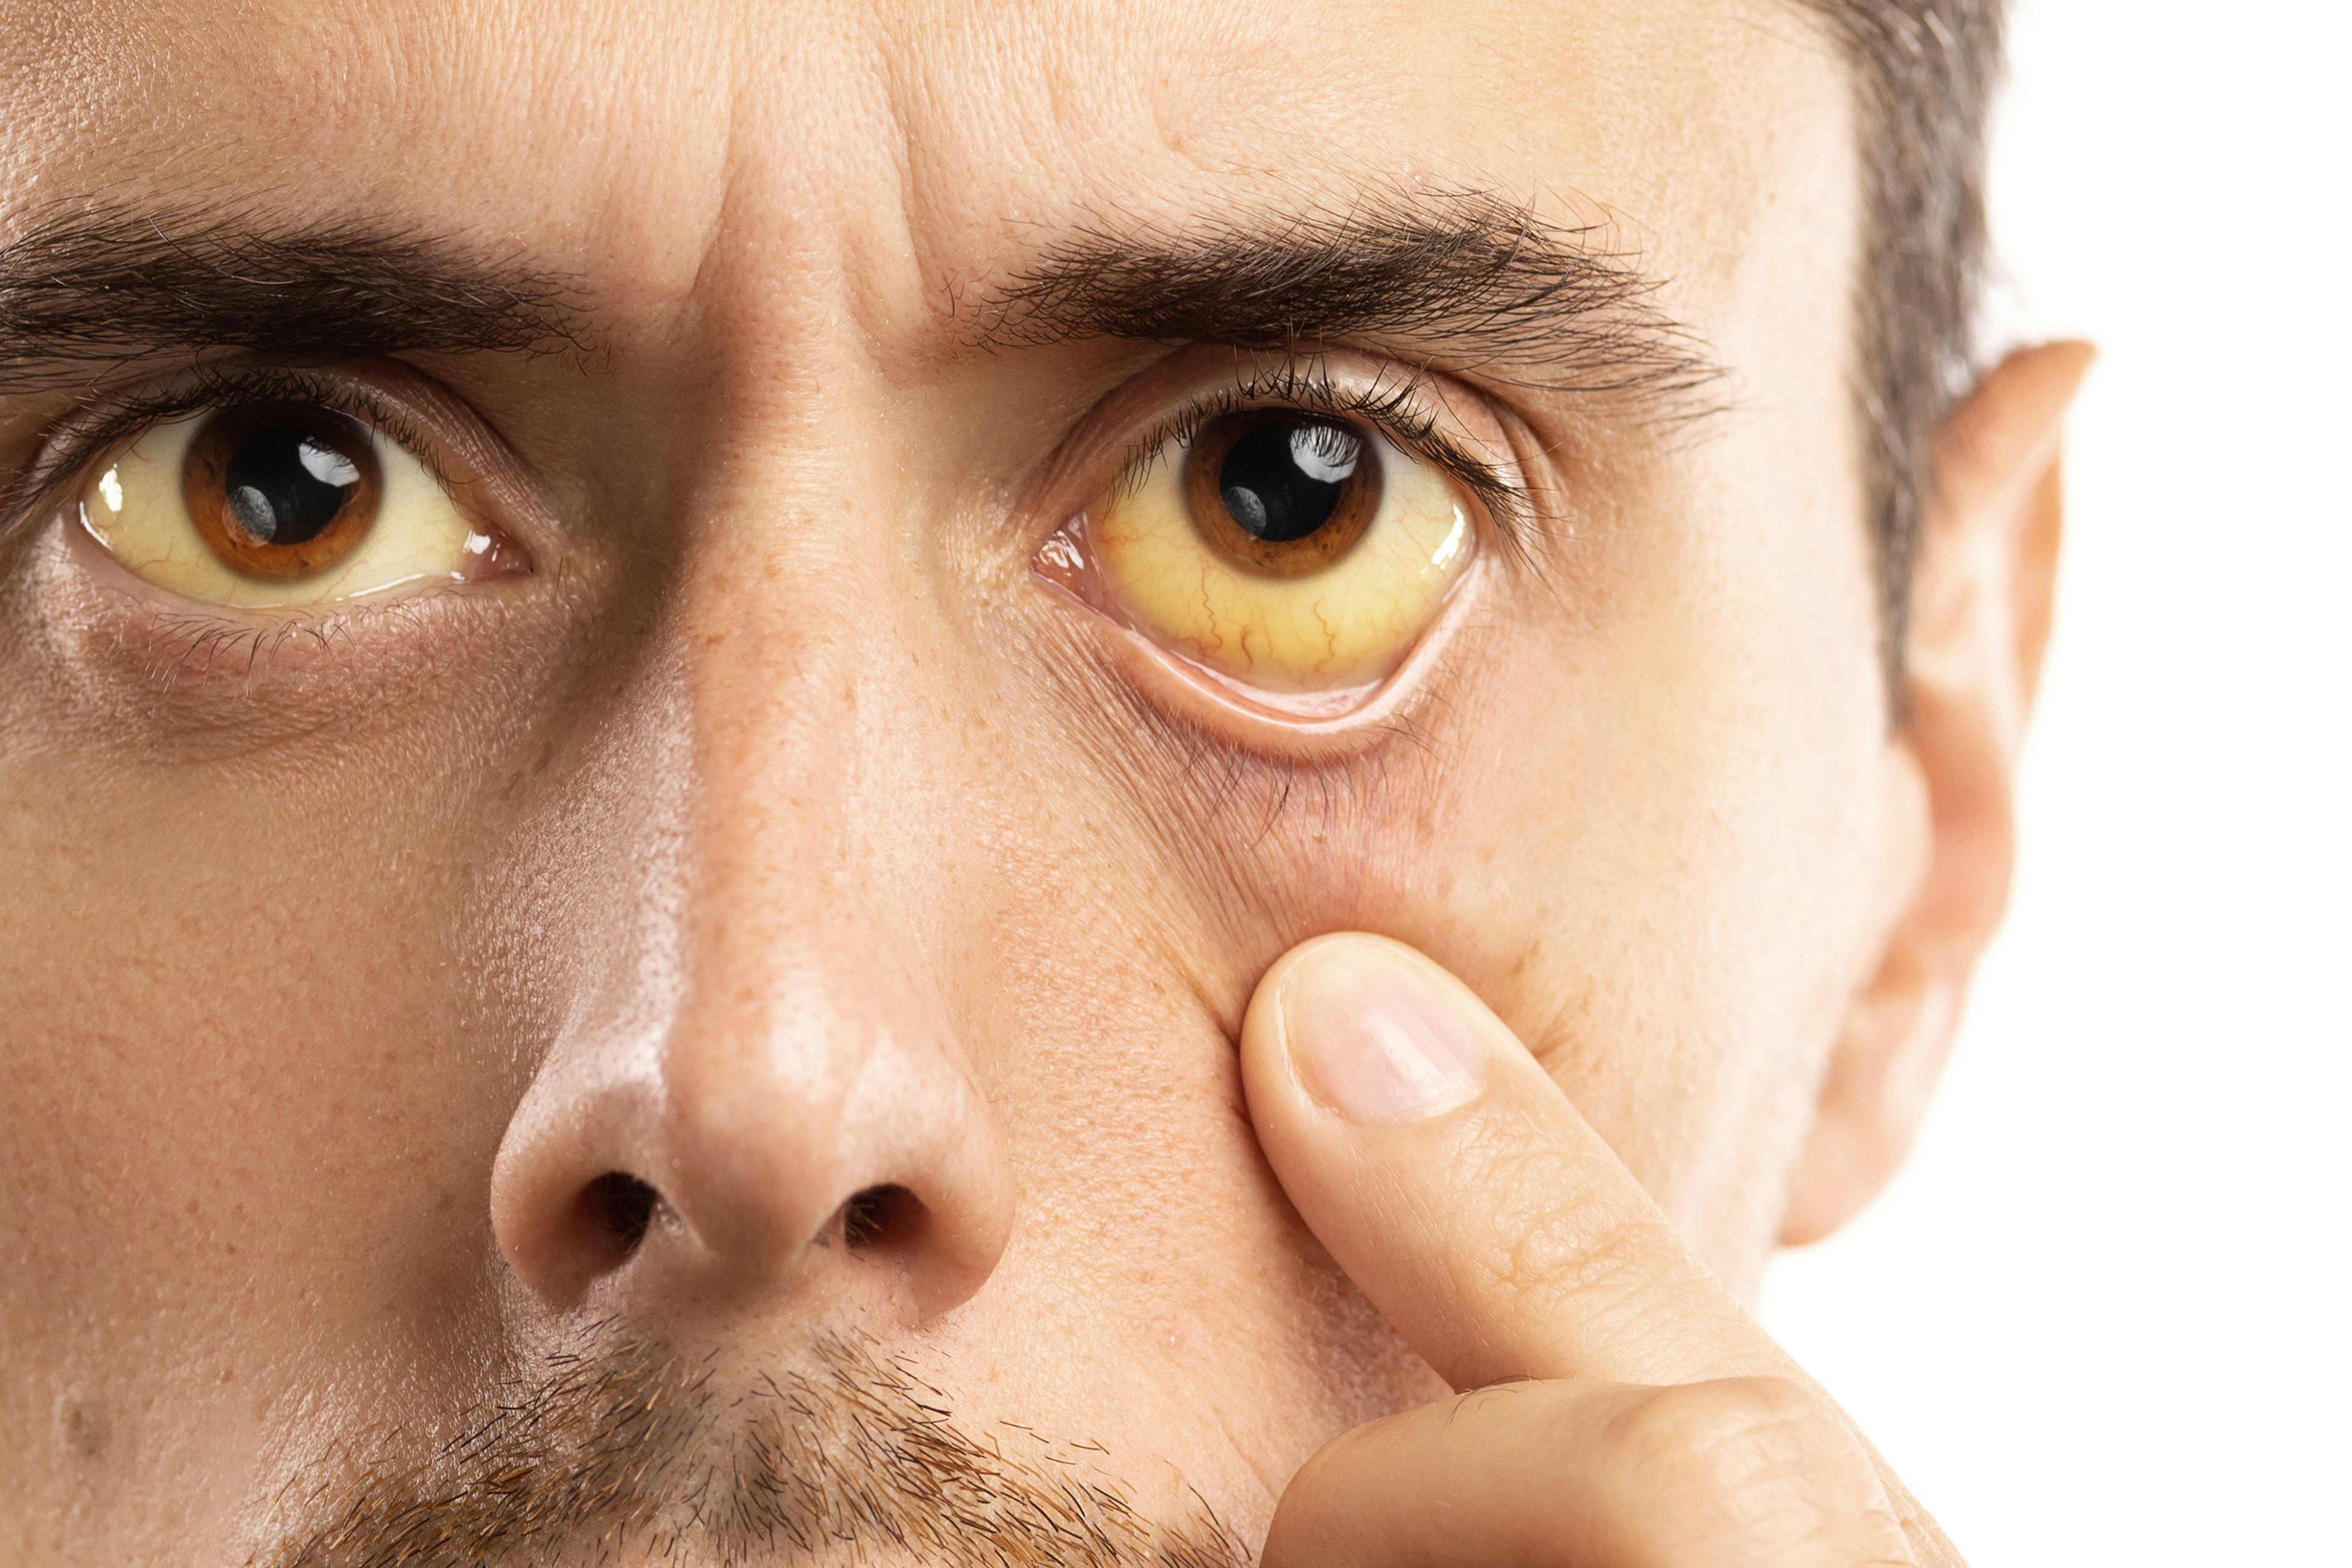 metastatic cancer eyes symptoms